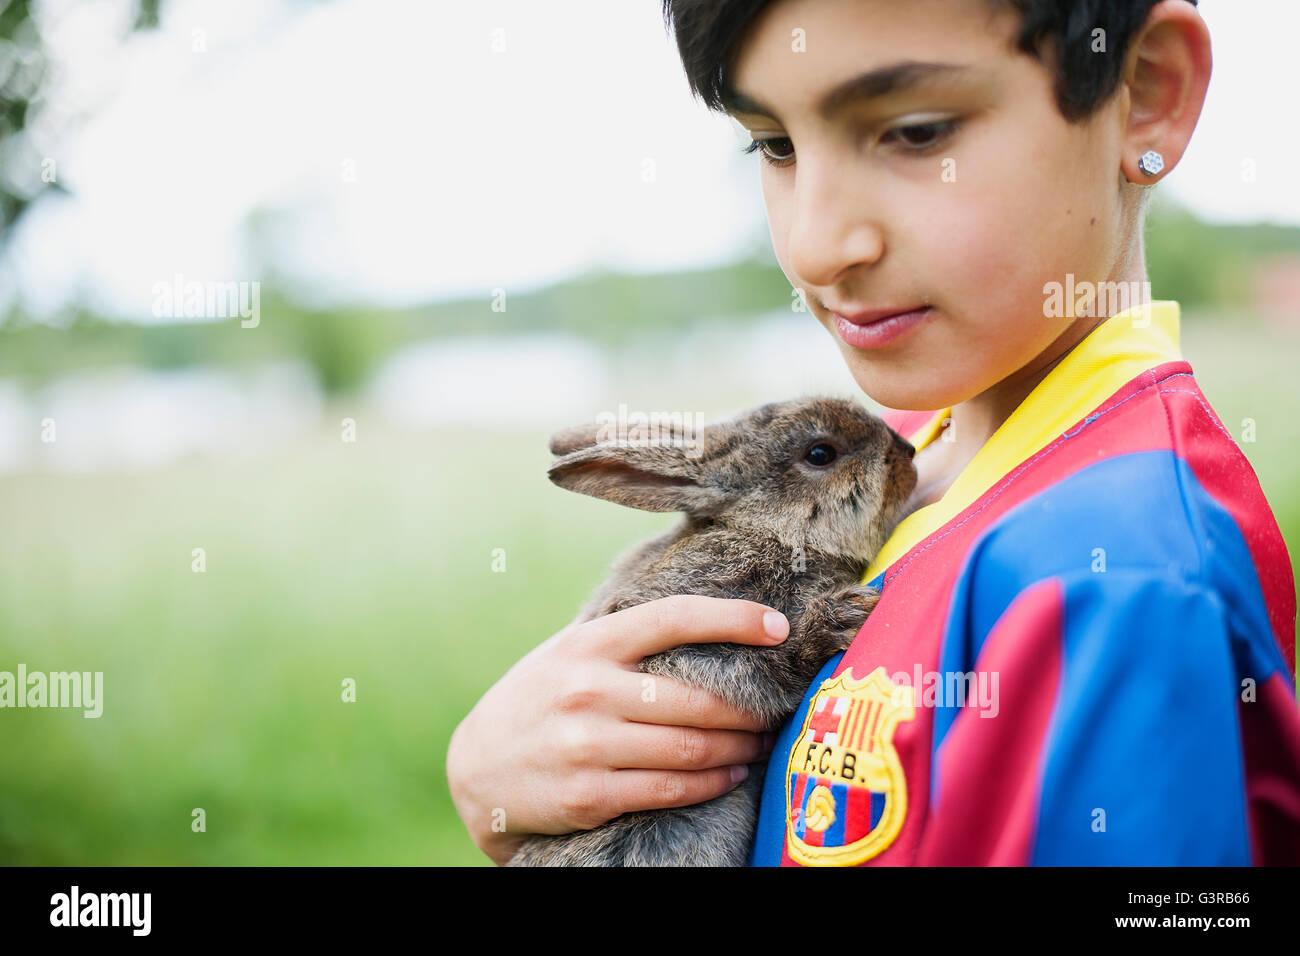 Sweden, Varmland, Filipstad, Gasborn, Horrsjon, Boy (10-11) in sport jersey holding rabbit - Stock Image